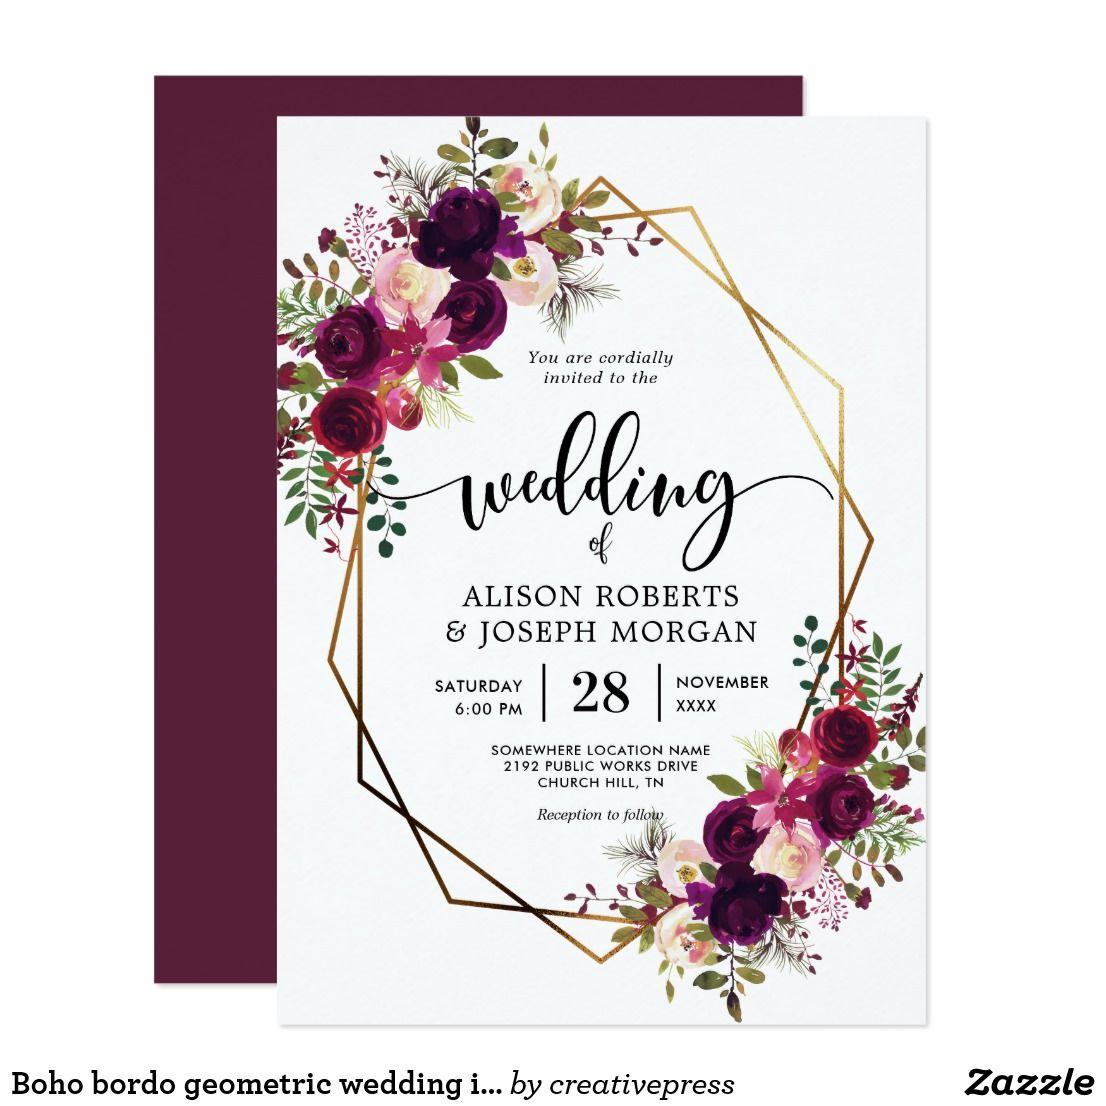 Boho Bordo Geometric Wedding Invitation Zazzle Com Wedding Invitations Boho Geometric Wedding Wedding Invitations